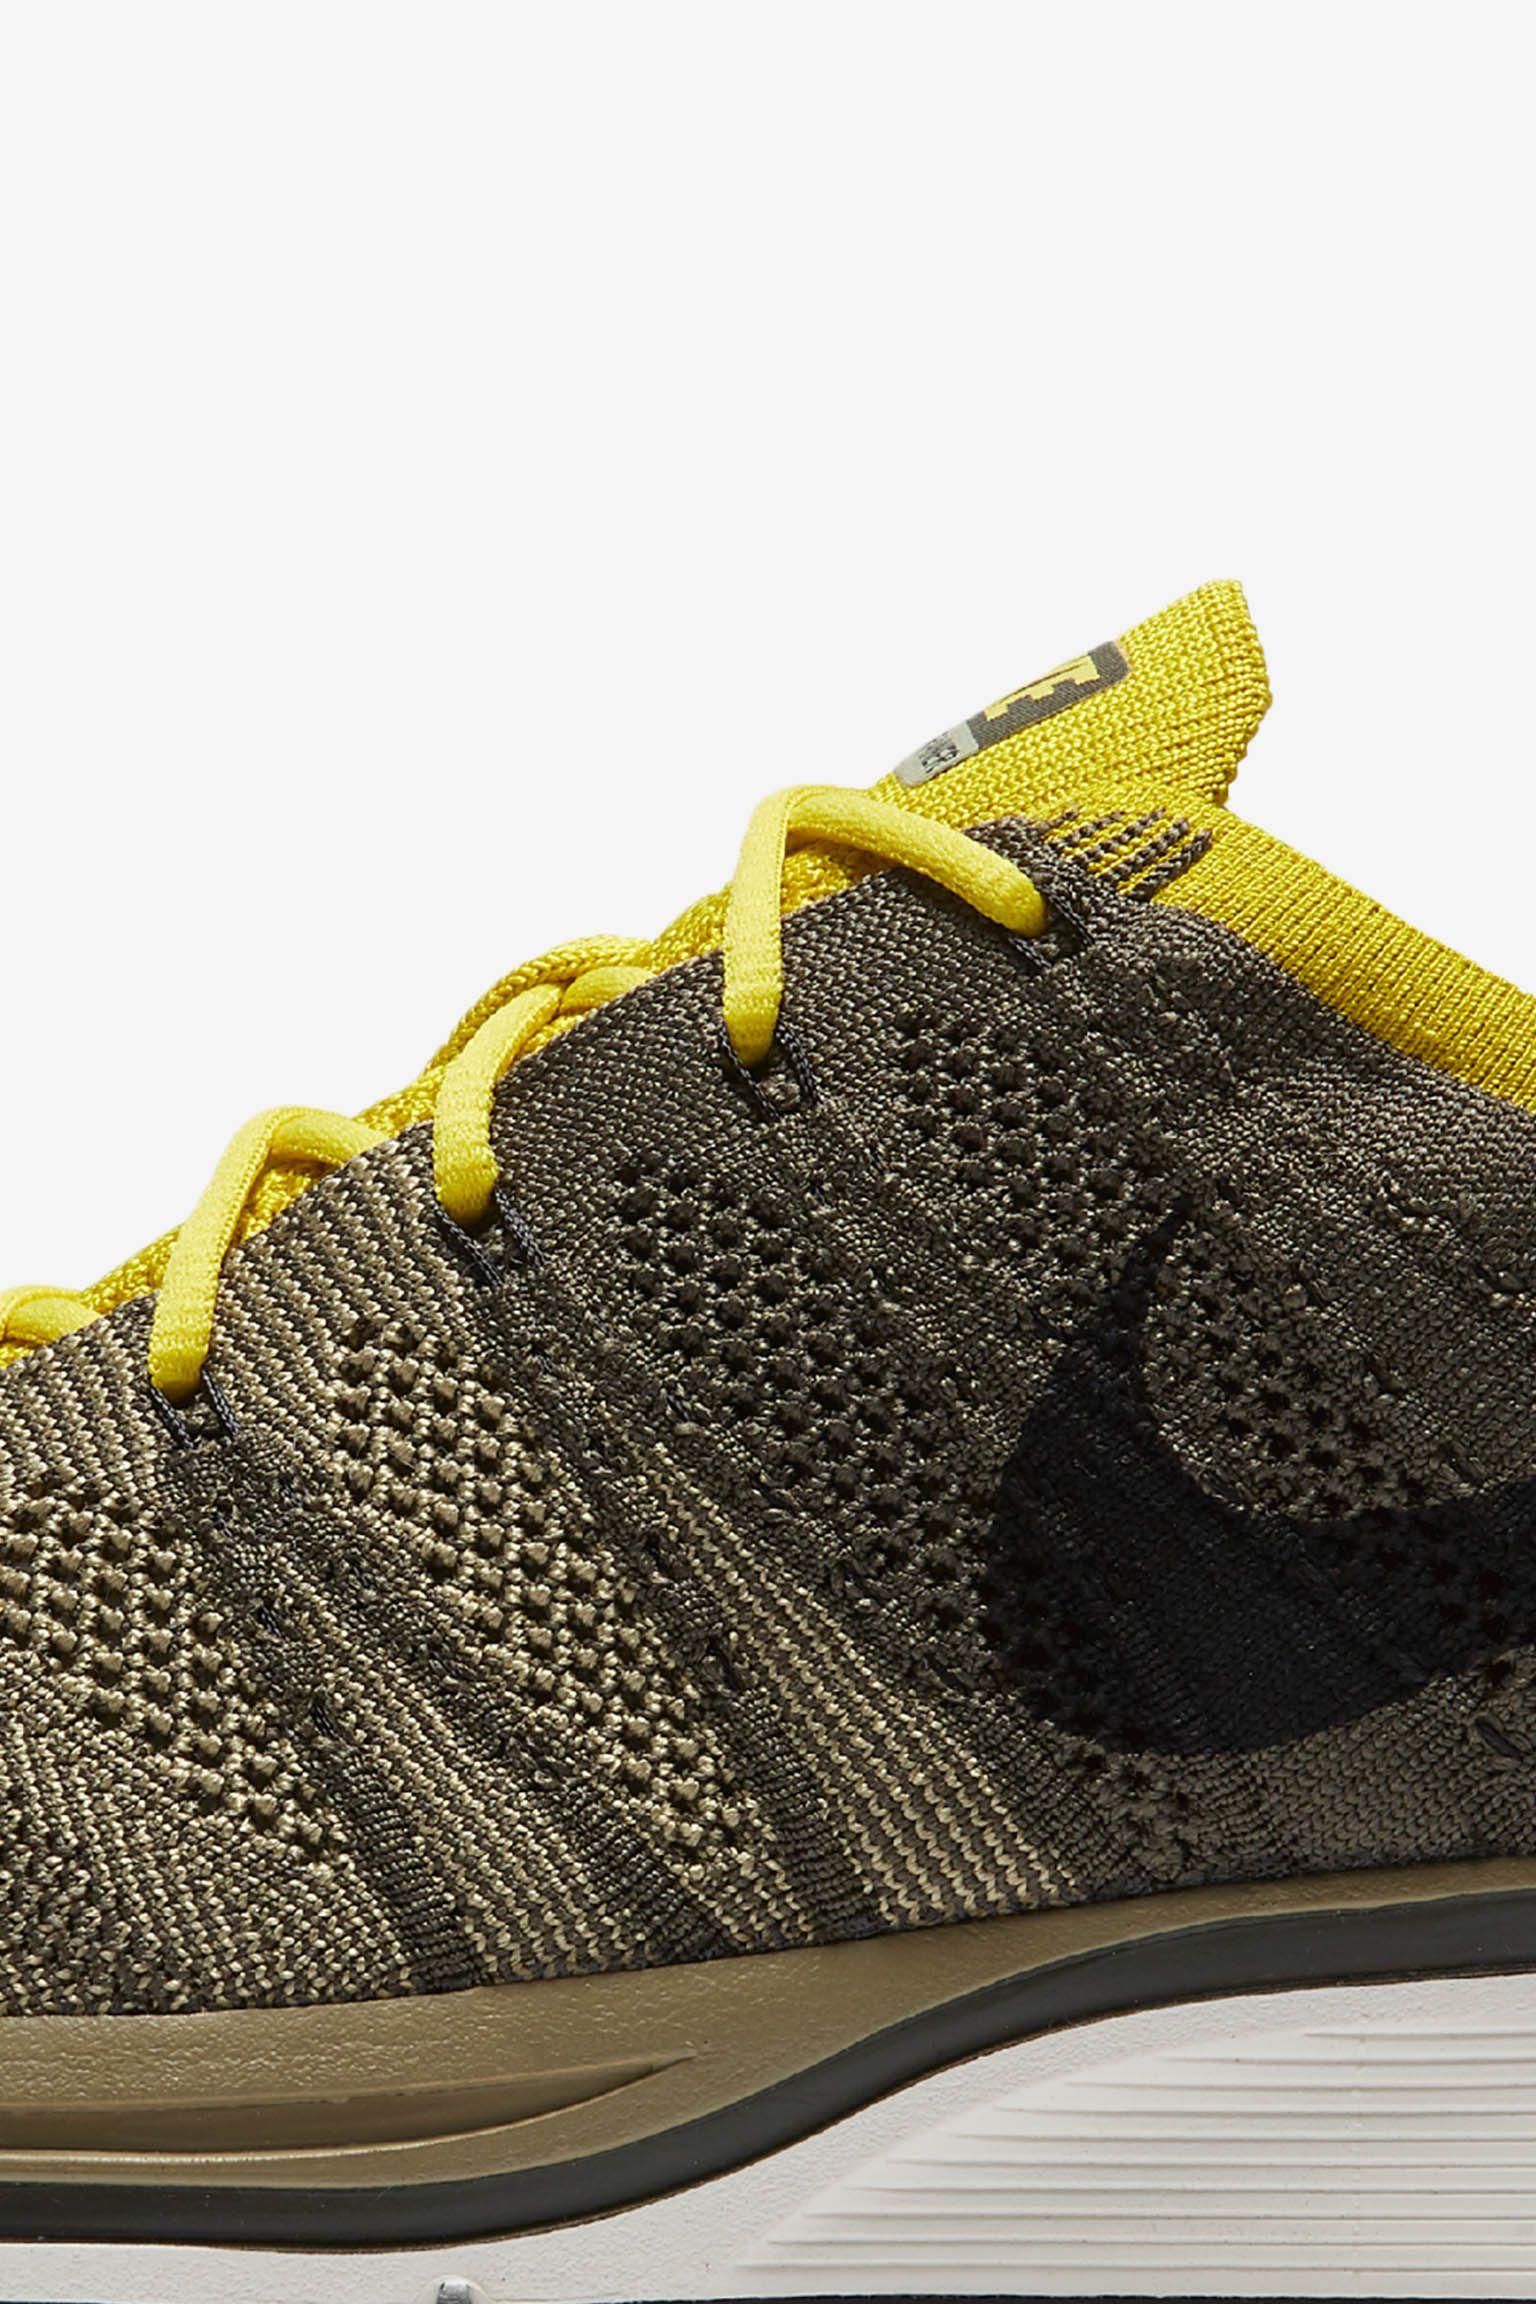 Nike Flyknit Trainer 'Cargo Khaki & Bright Citron' Release Date